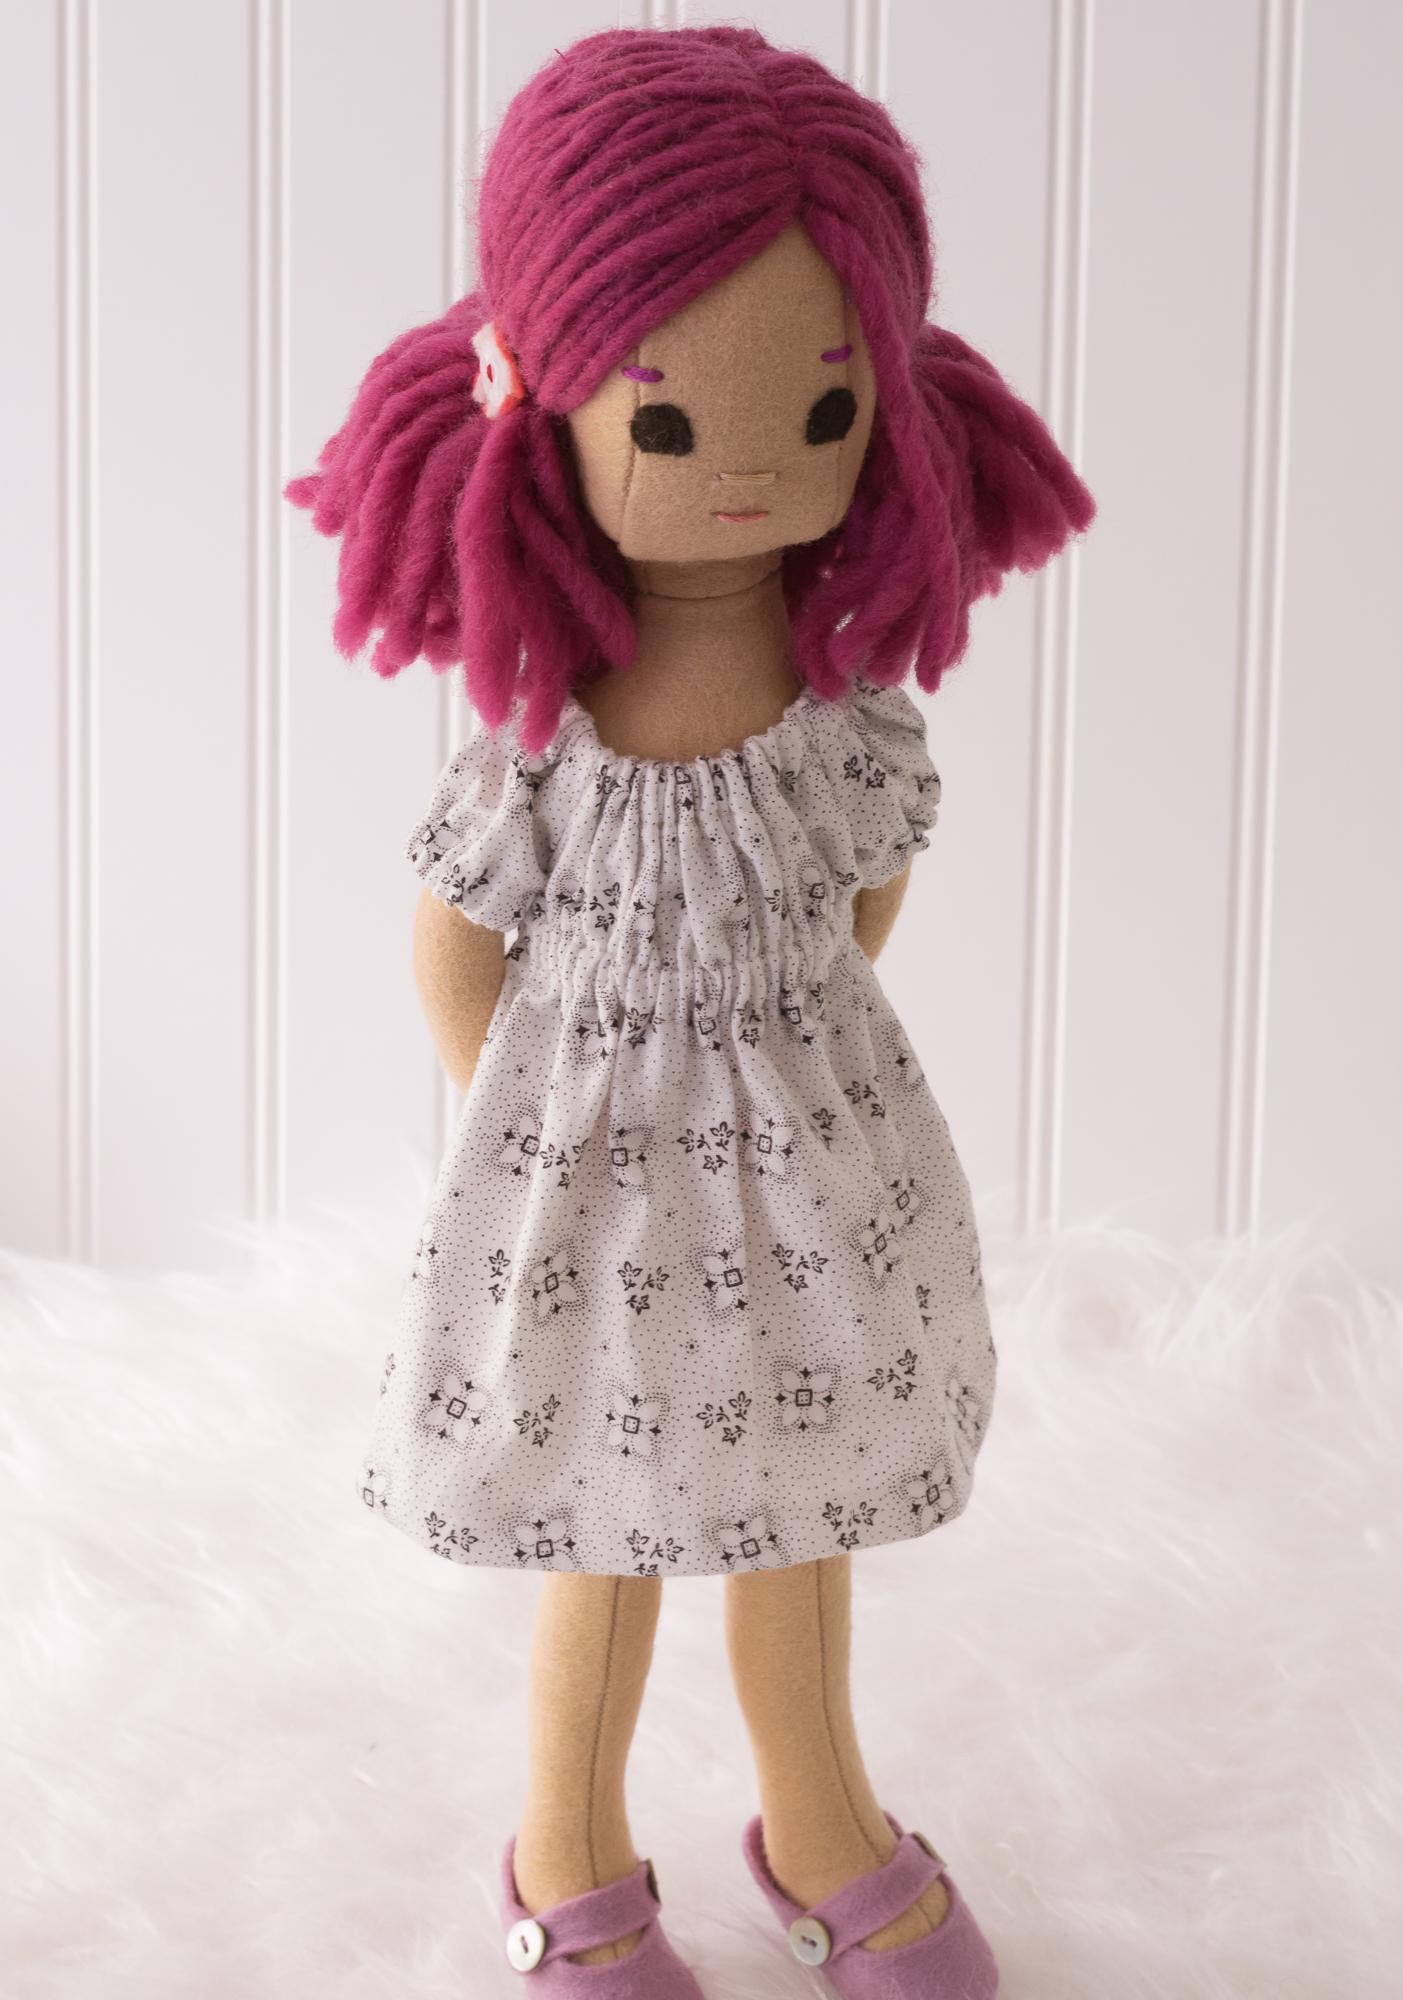 Gallery of Dolls-29.jpg